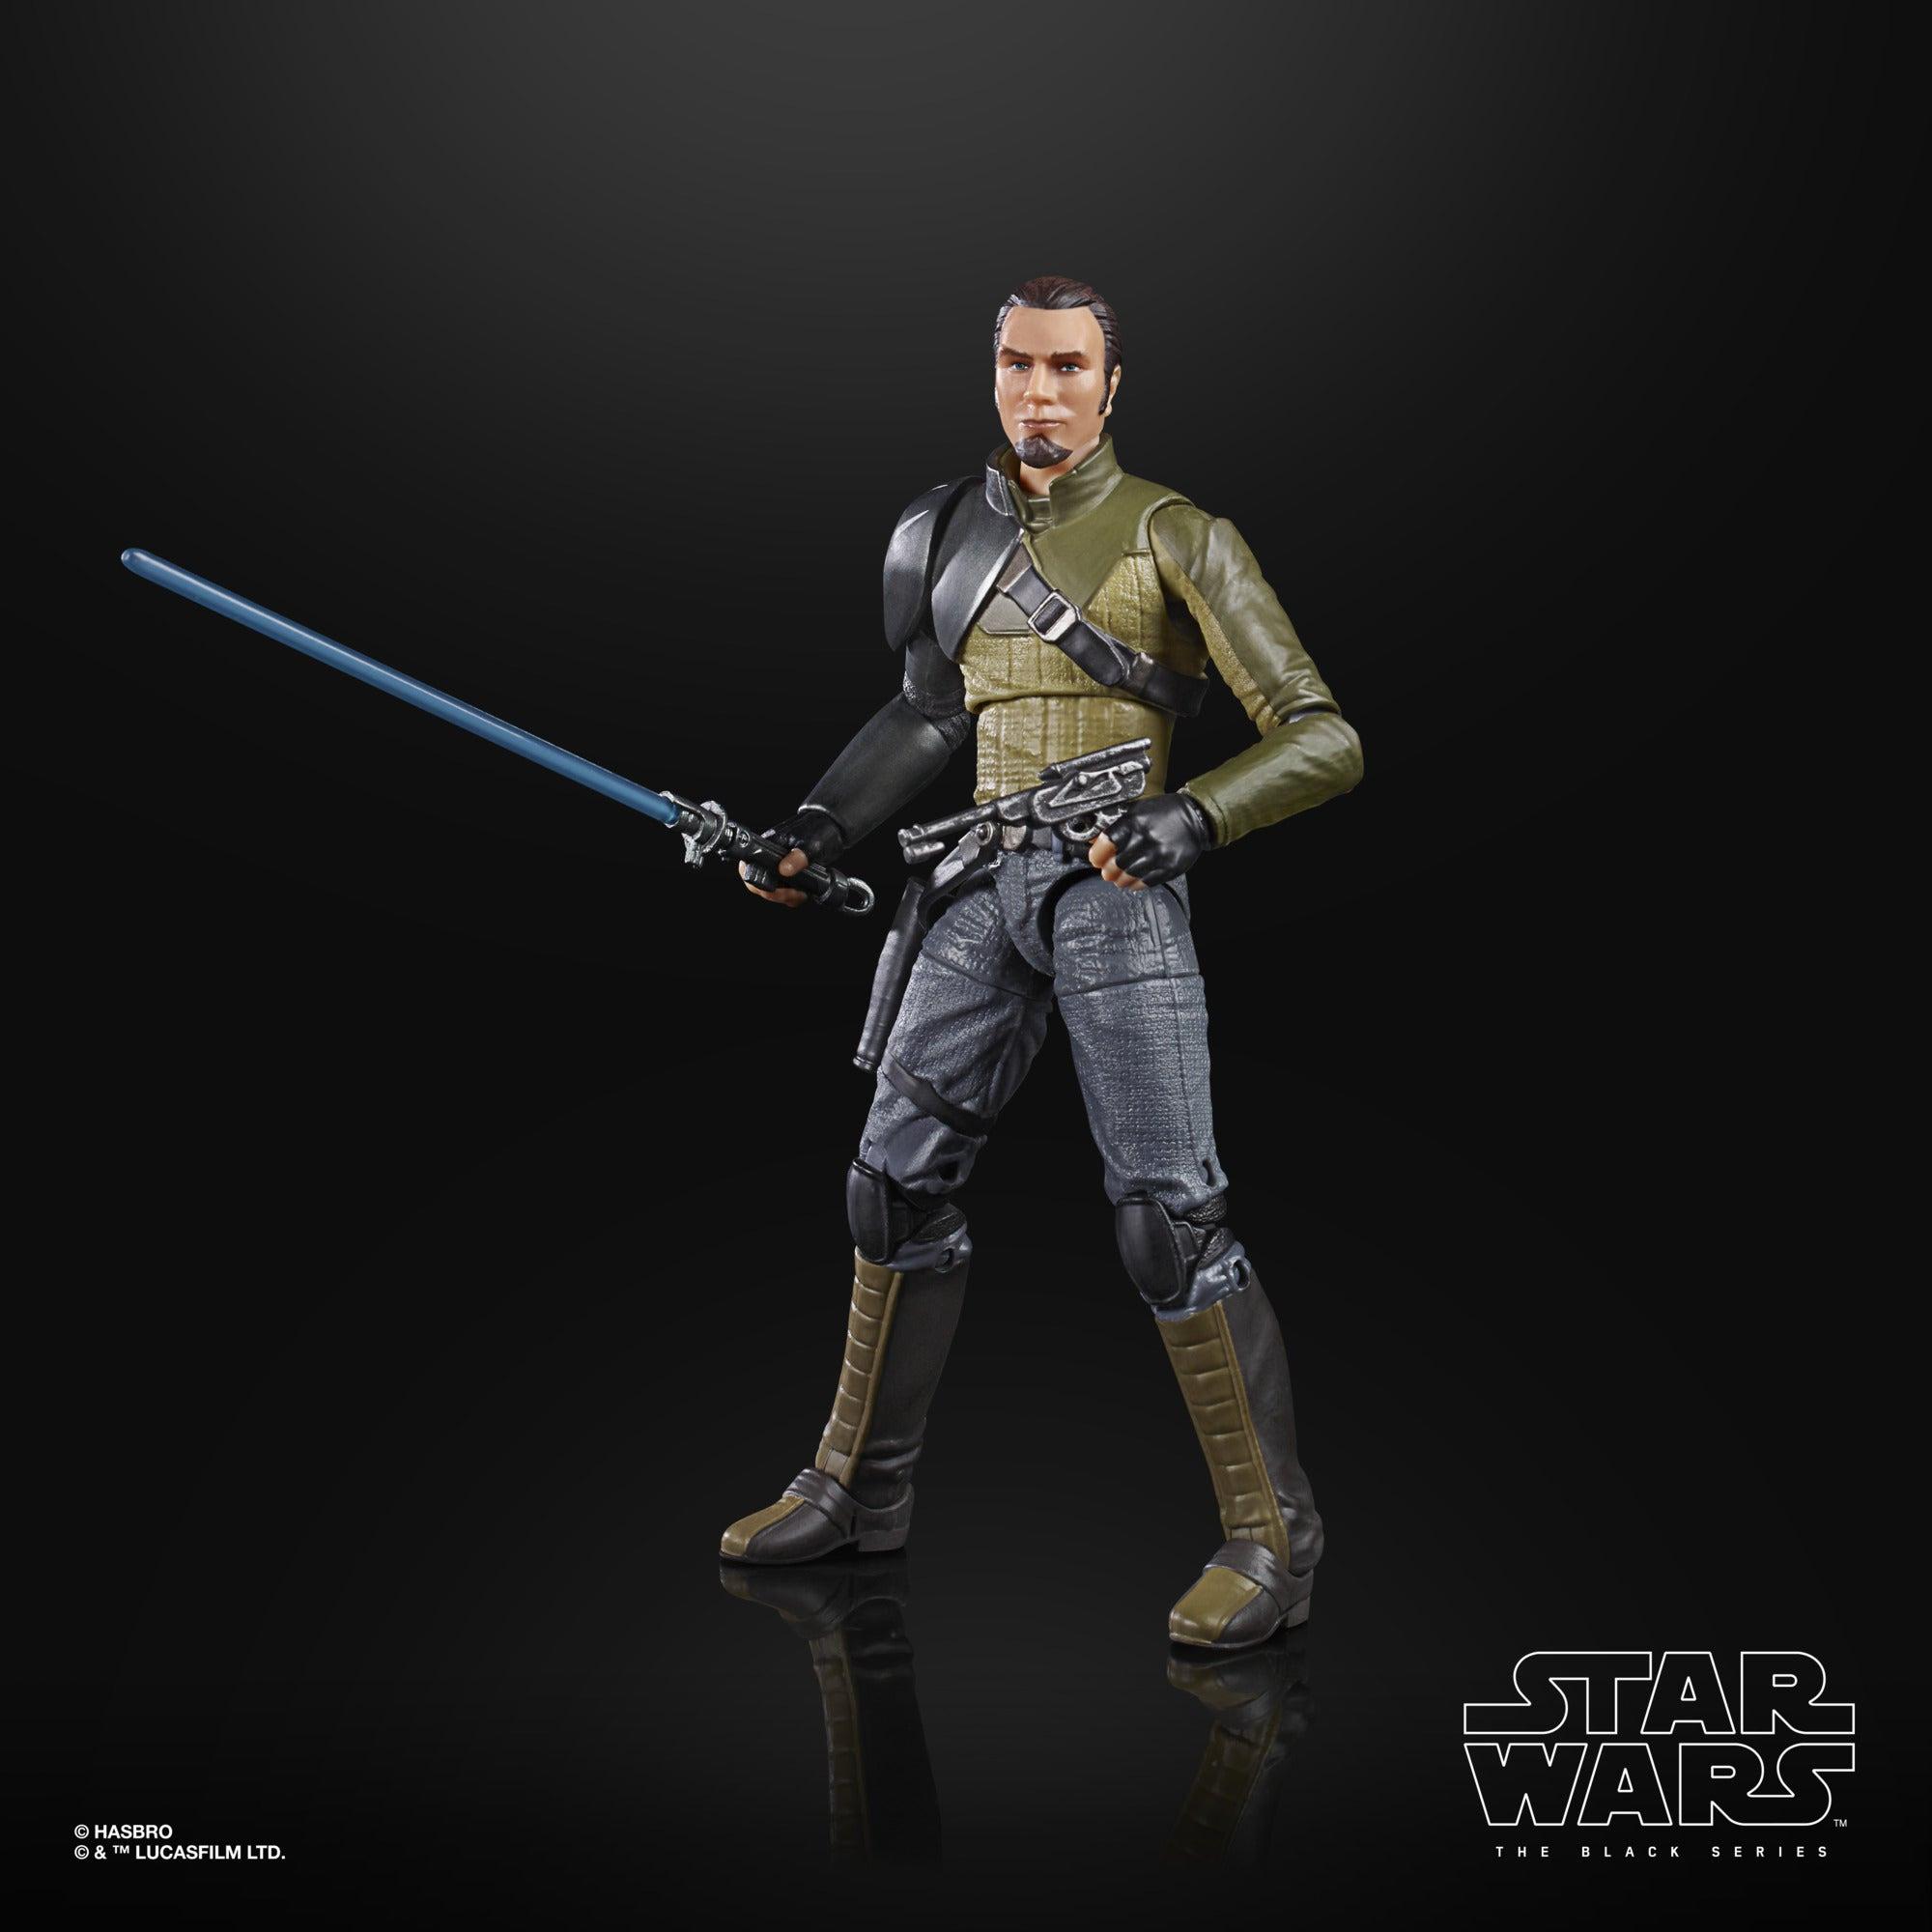 Image of Star Wars The Black Series Rebels Kanan Jarrus 6-Inch Action Figure - SEPTEMBER 2020